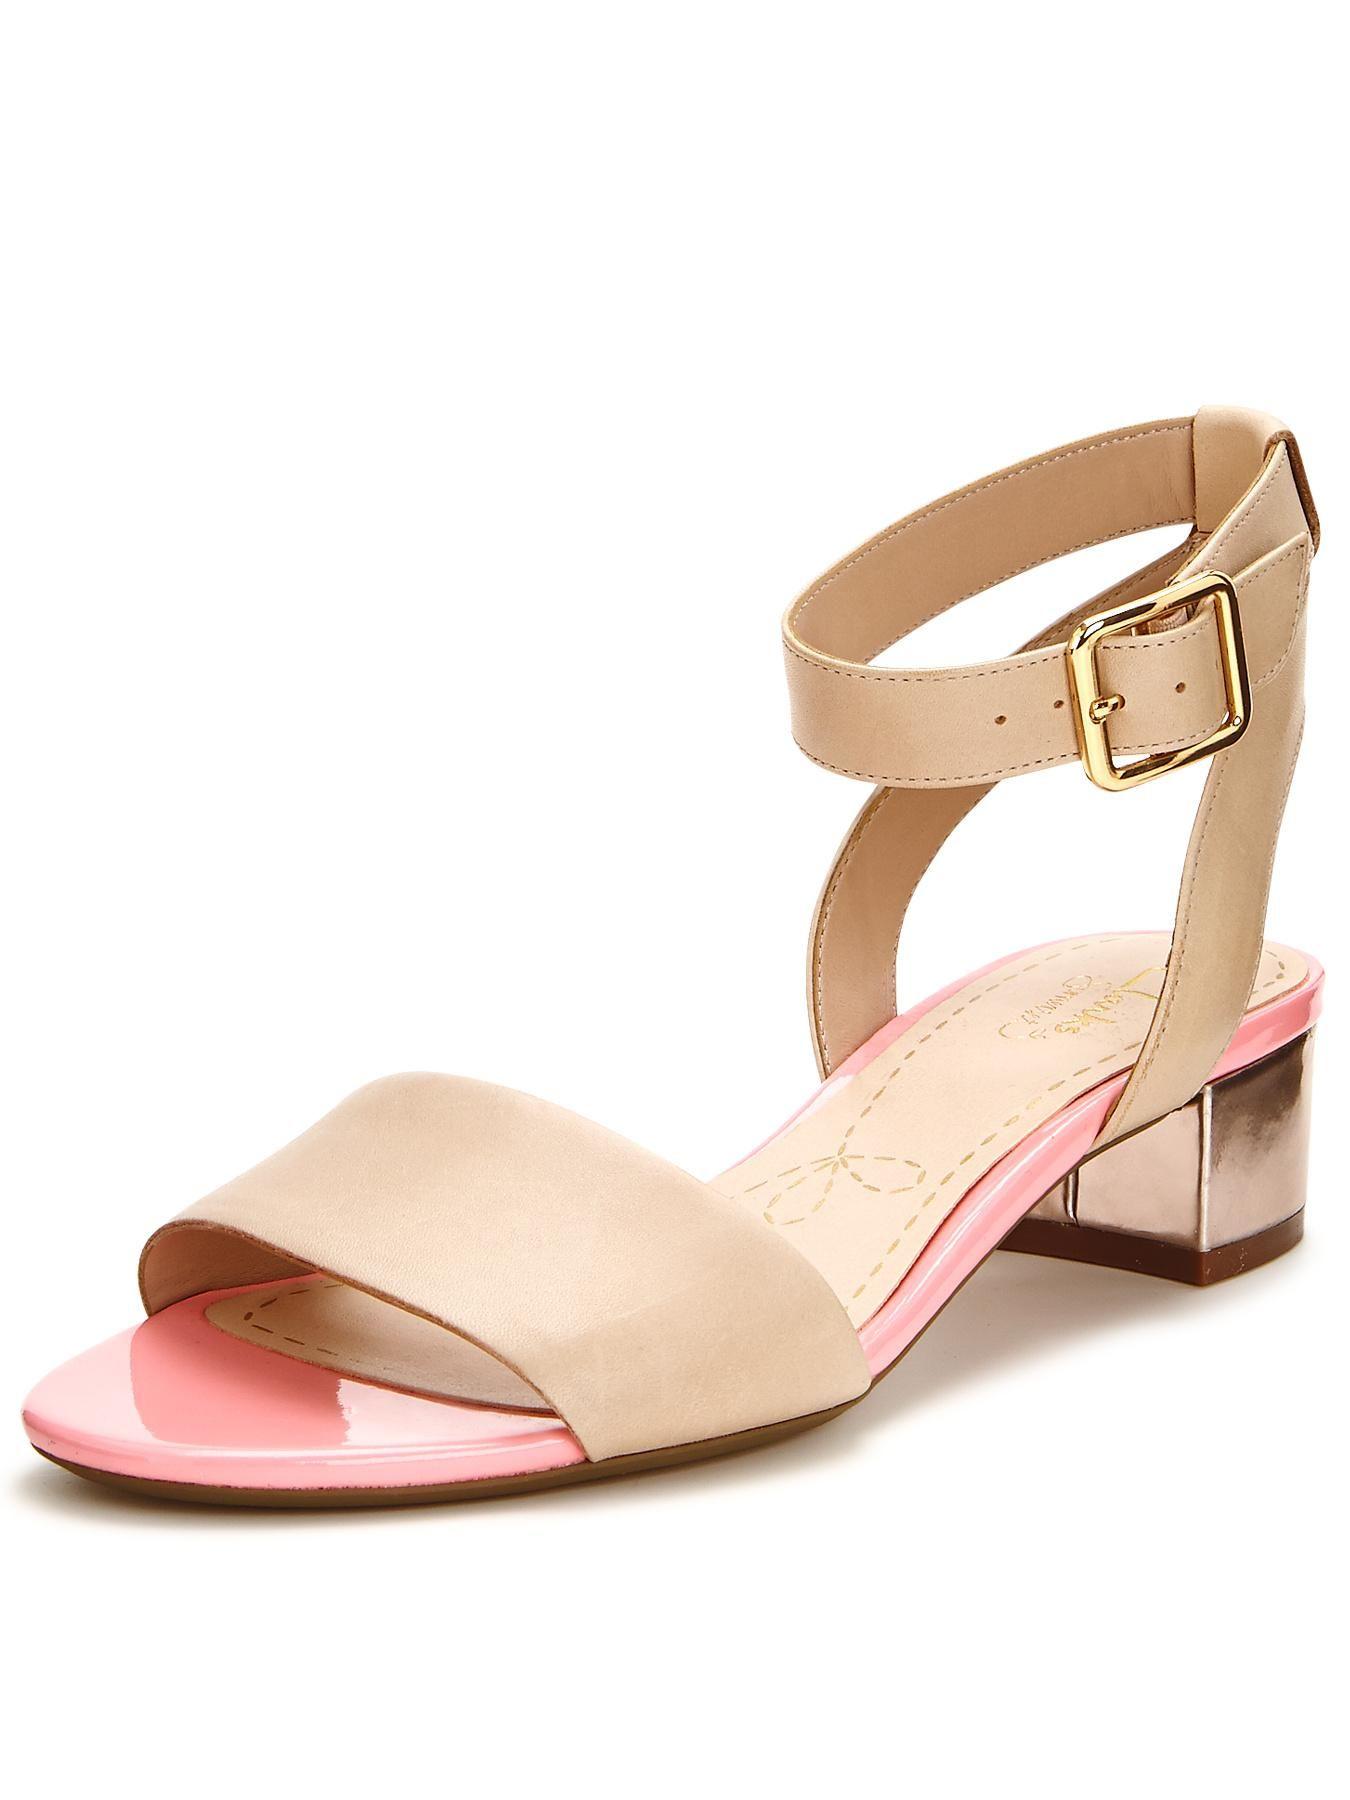 5e19141ed8f3a4 Clarks Sharna Balcony Sandals - Oyster